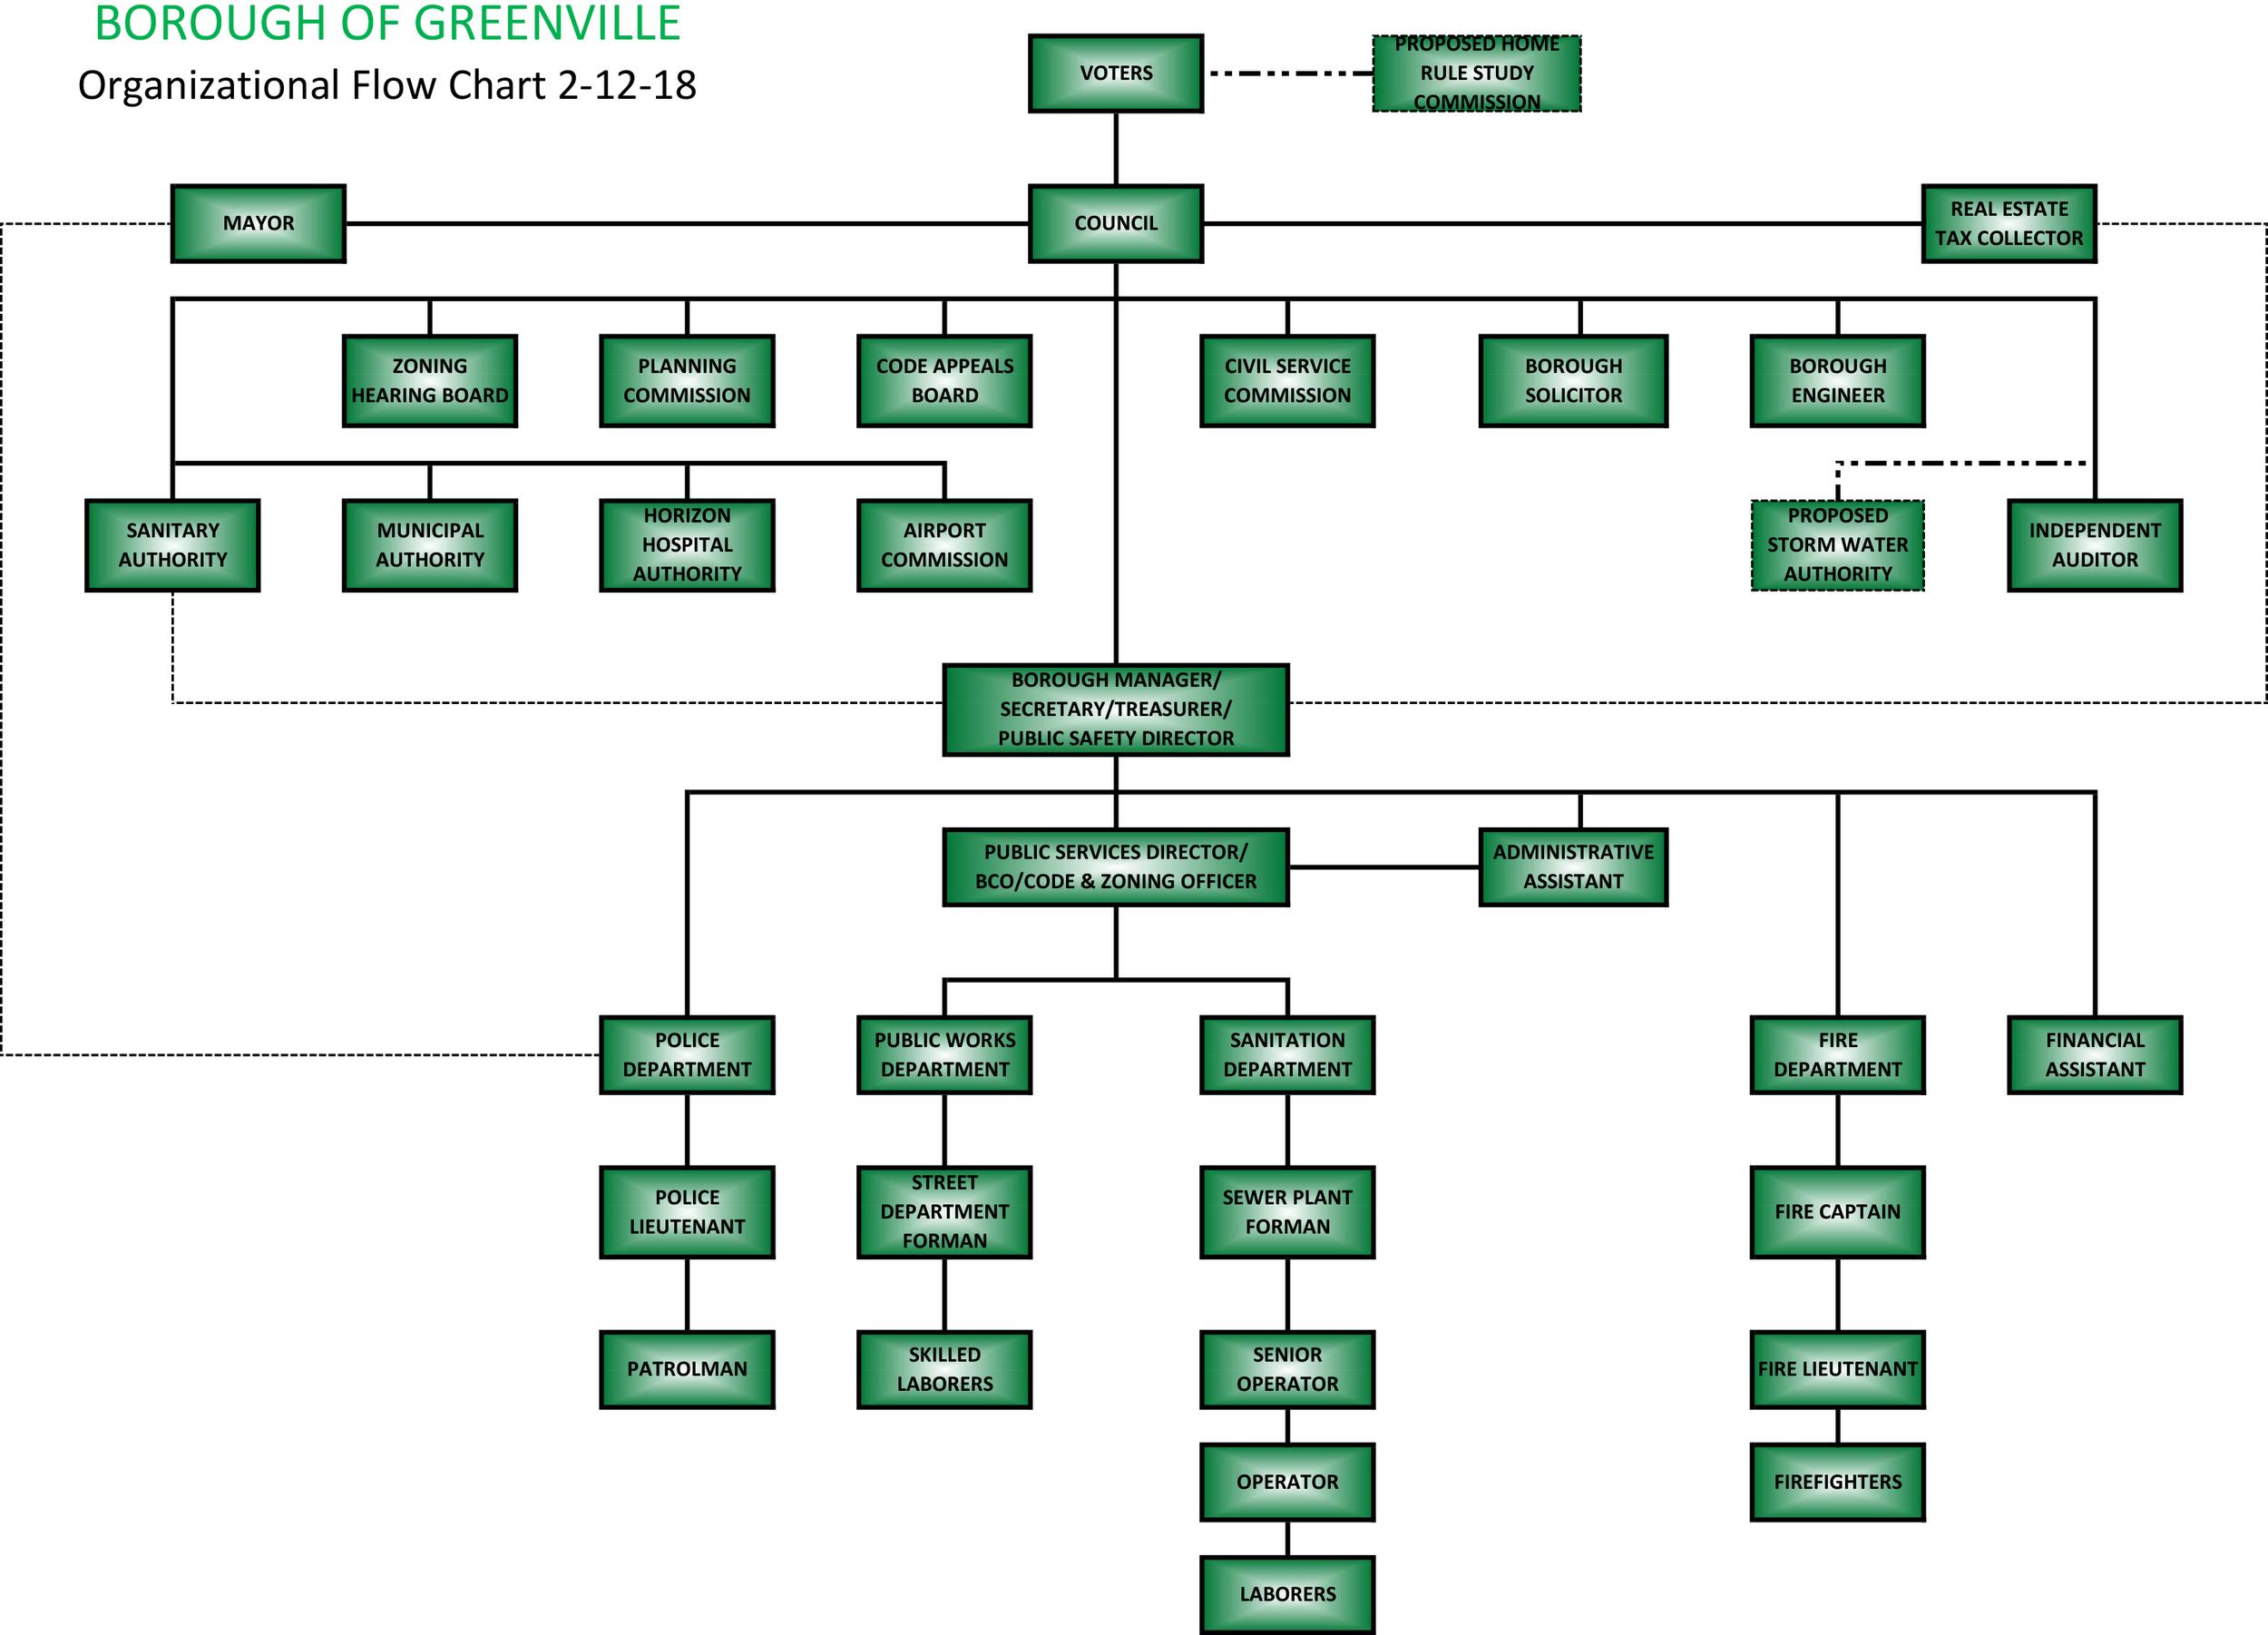 Borough of Greenville Organizational Flow Chart.png